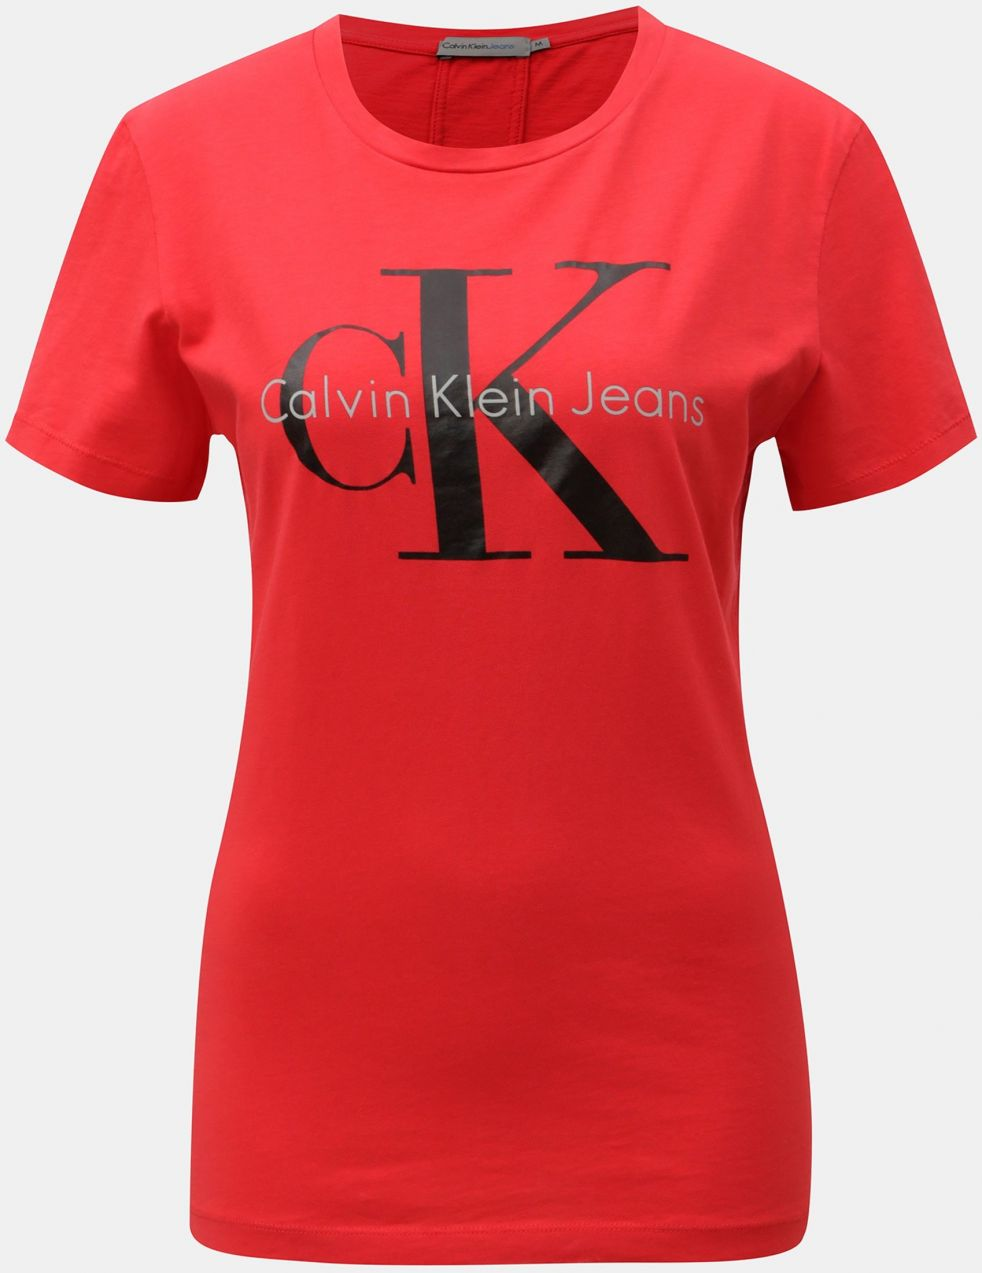 15343f9ecaed Červené dámske tričko s potlačou Calvin Klein Jeans značky Calvin Klein  Jeans - Lovely.sk